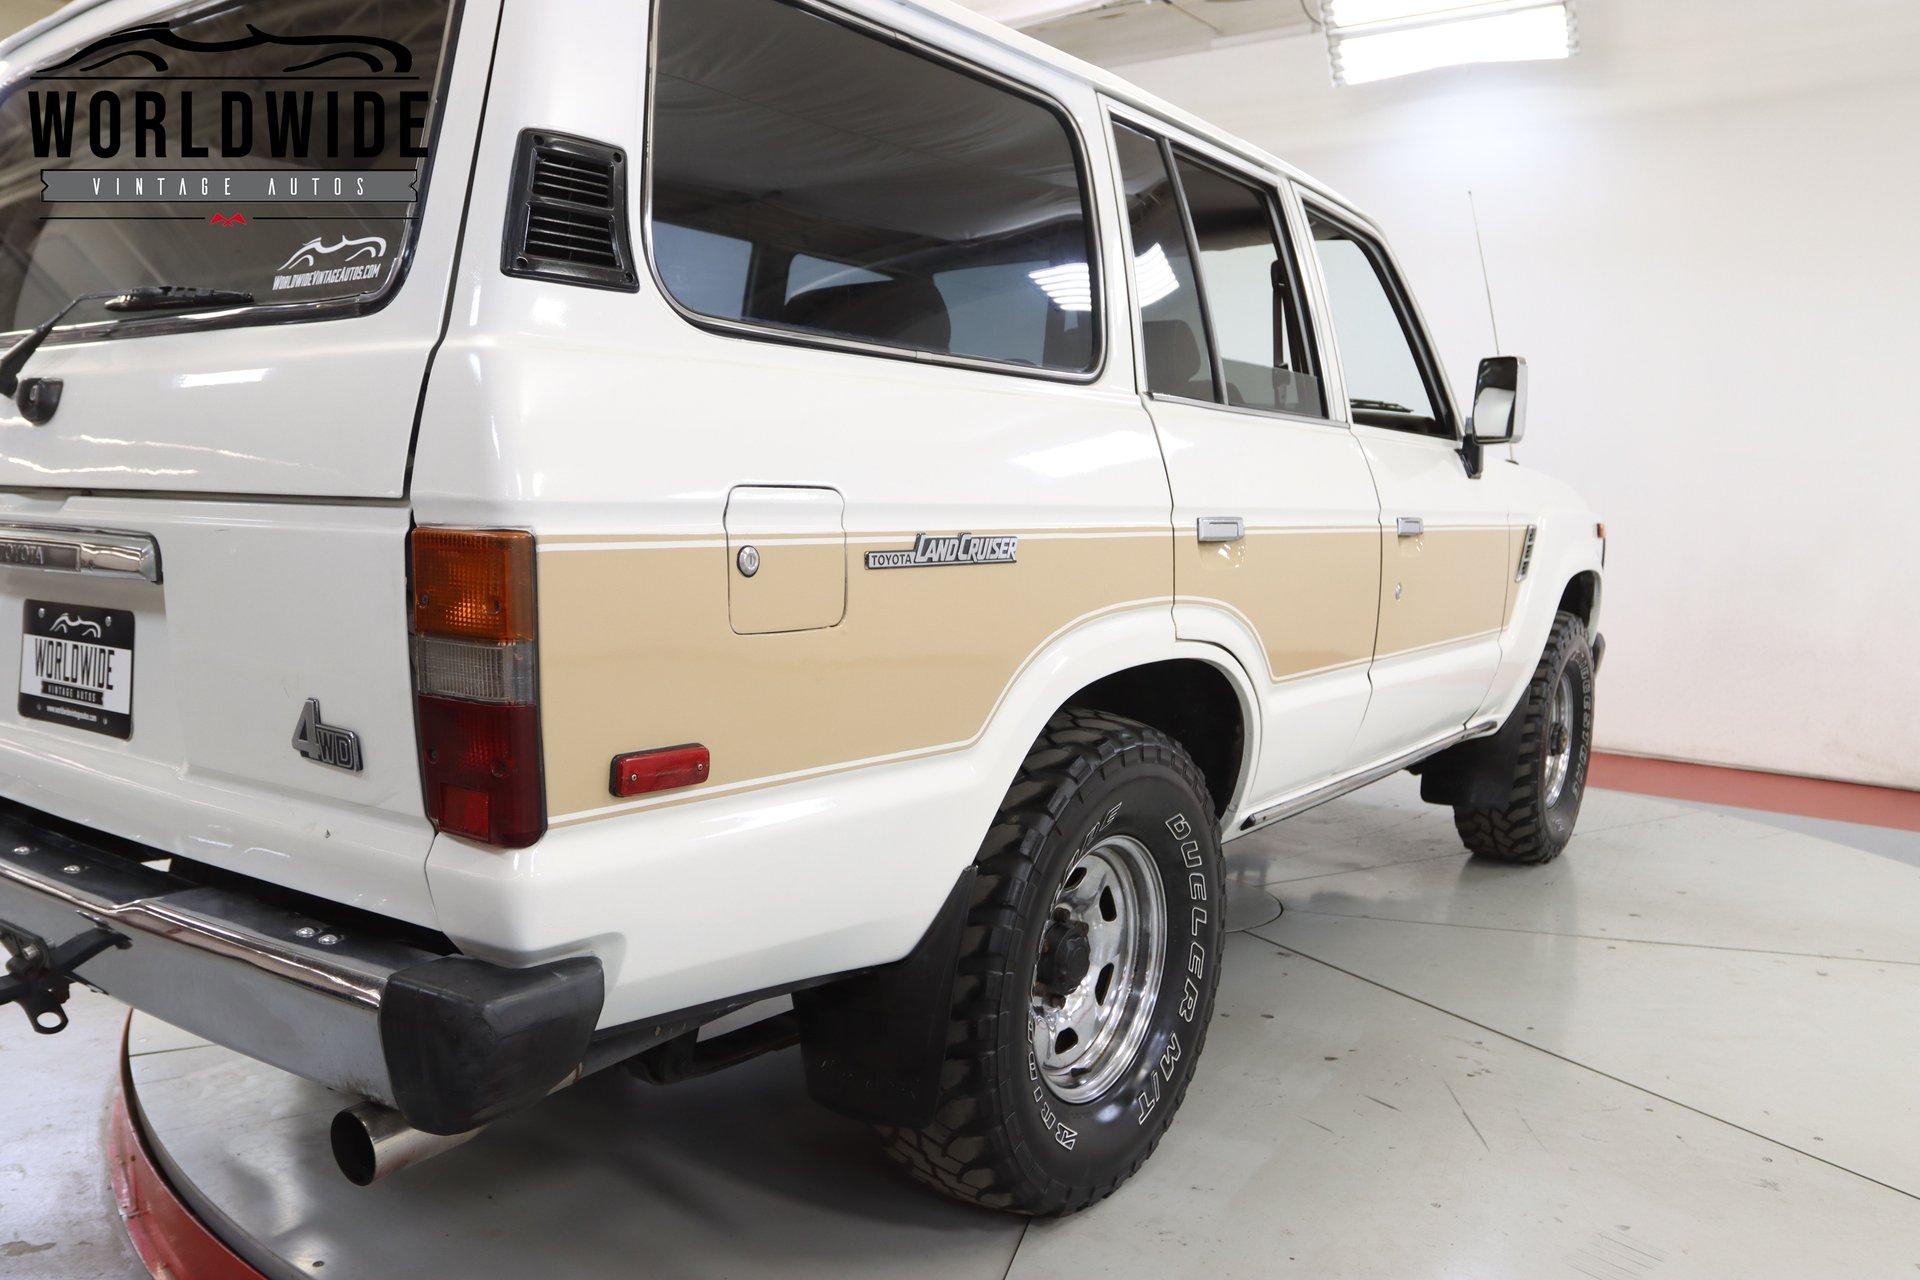 1989 Toyota FJ62 Land Cruiser